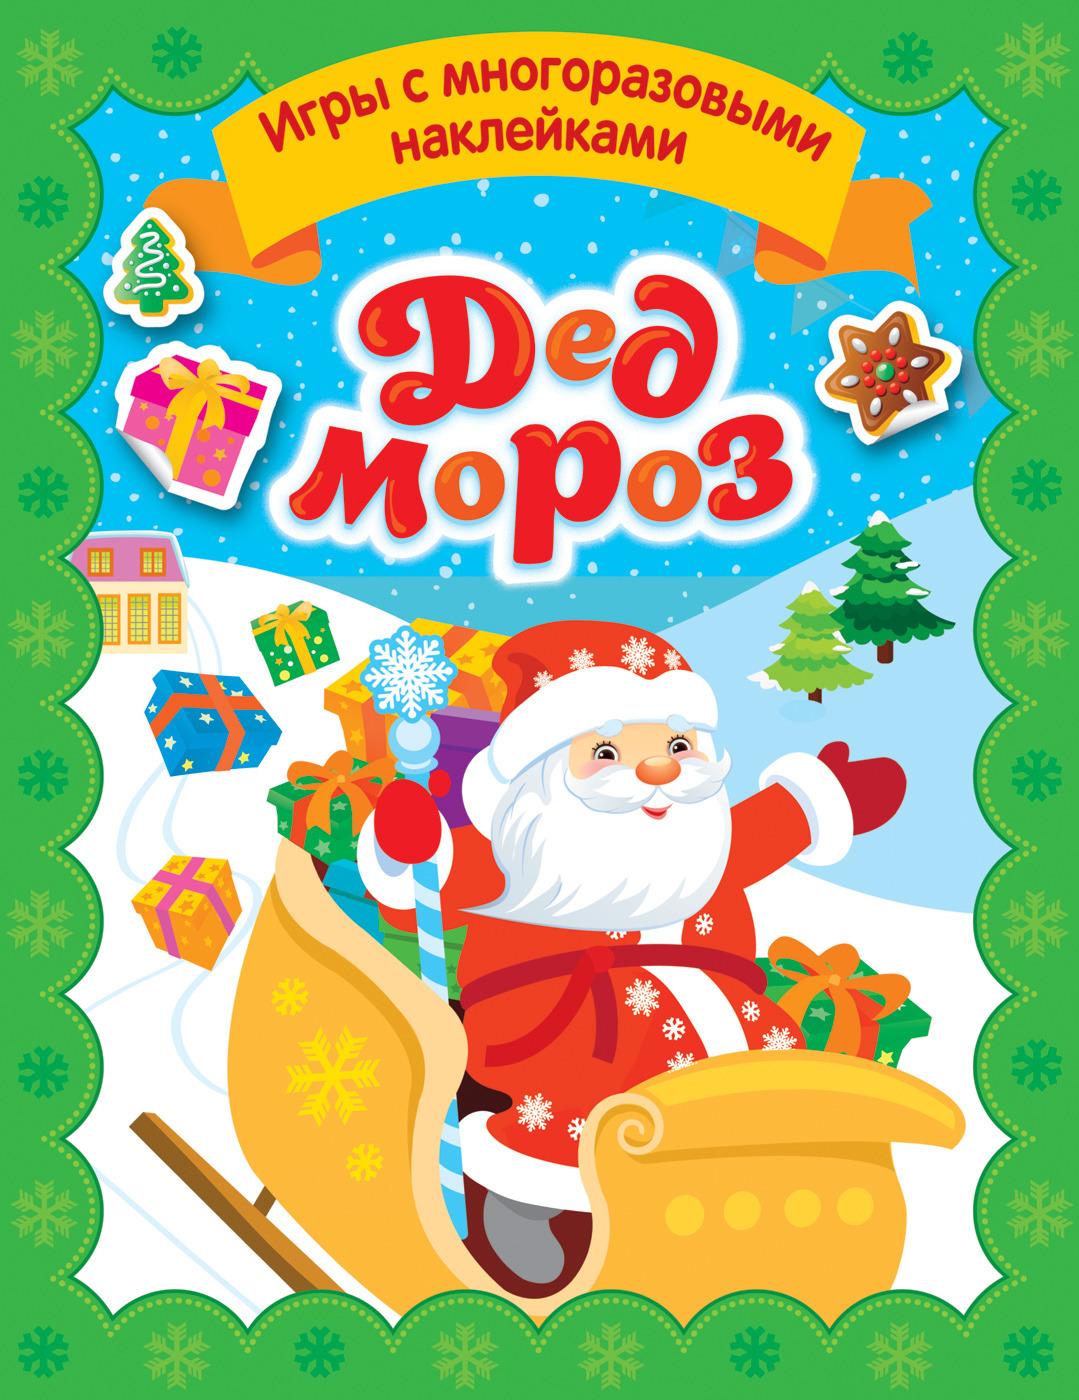 Н. И. Котятова Дед Мороз. Игры с многоразовыми наклейками юлия винклер дед мороз и птичка наклейки